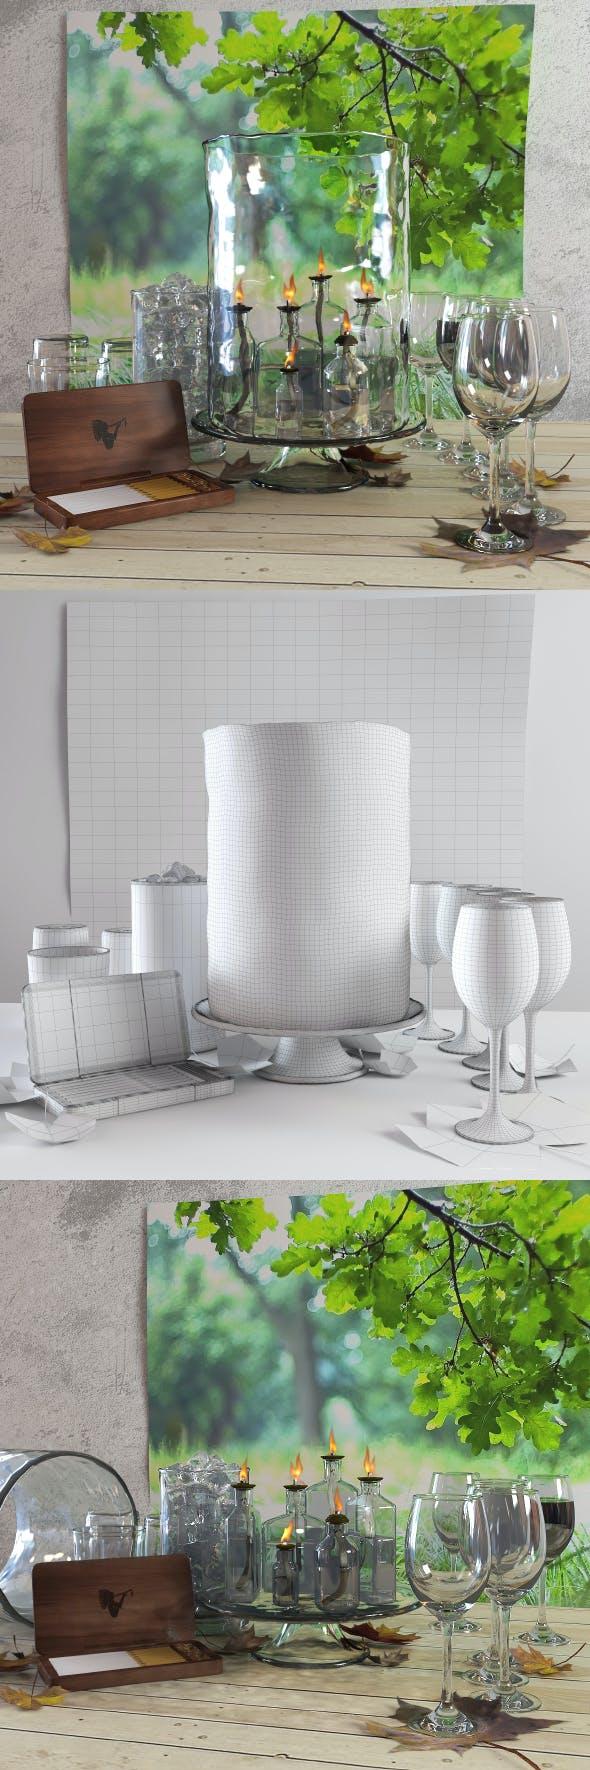 Decorative set 1 - 3DOcean Item for Sale